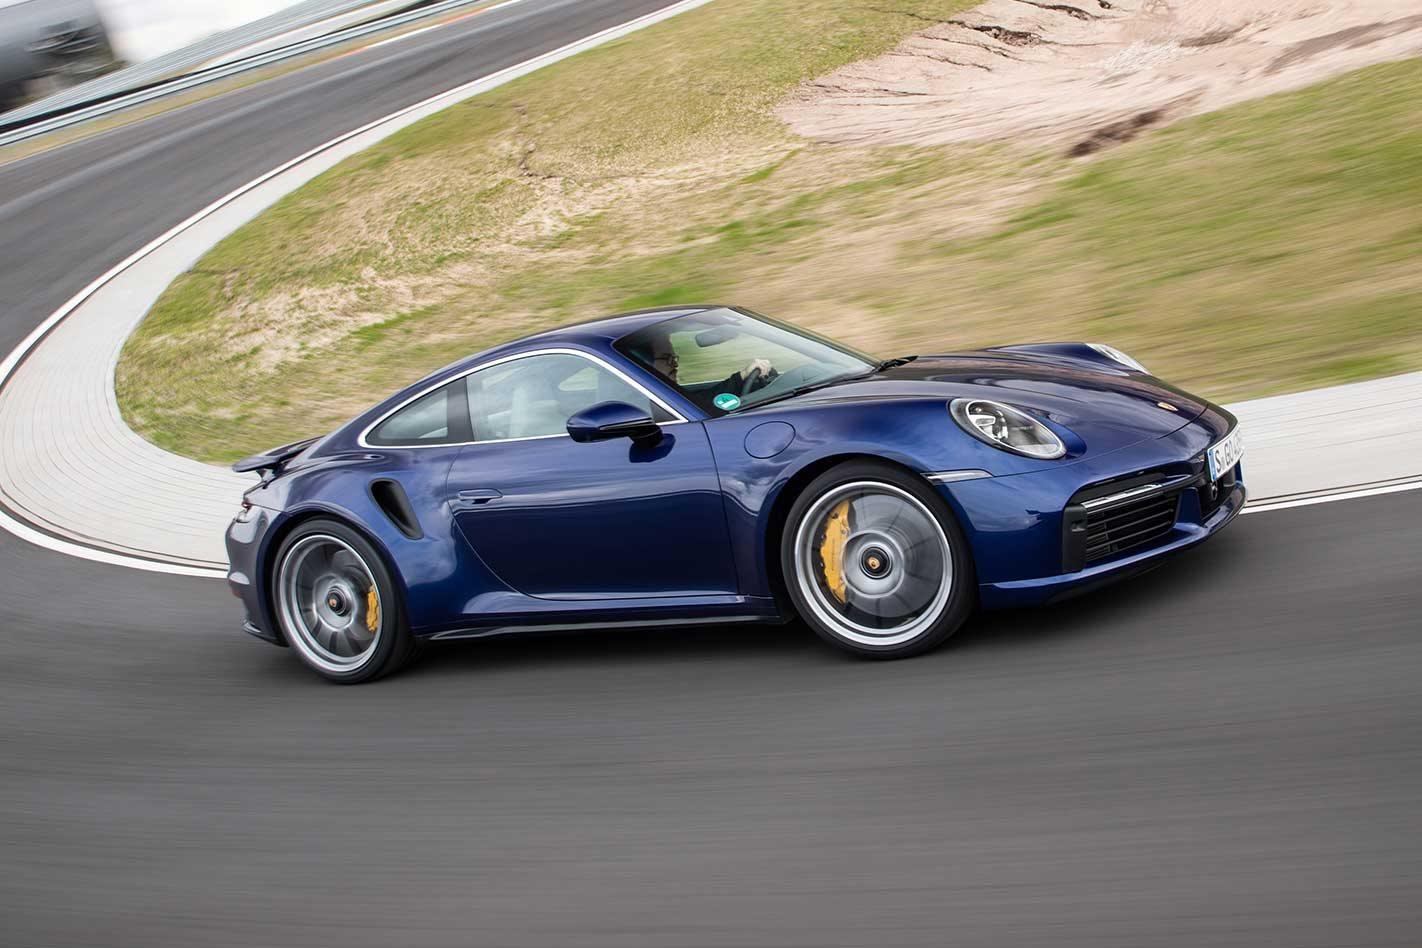 Gallery Shelved Porsche 992 911 Turbo S Launch